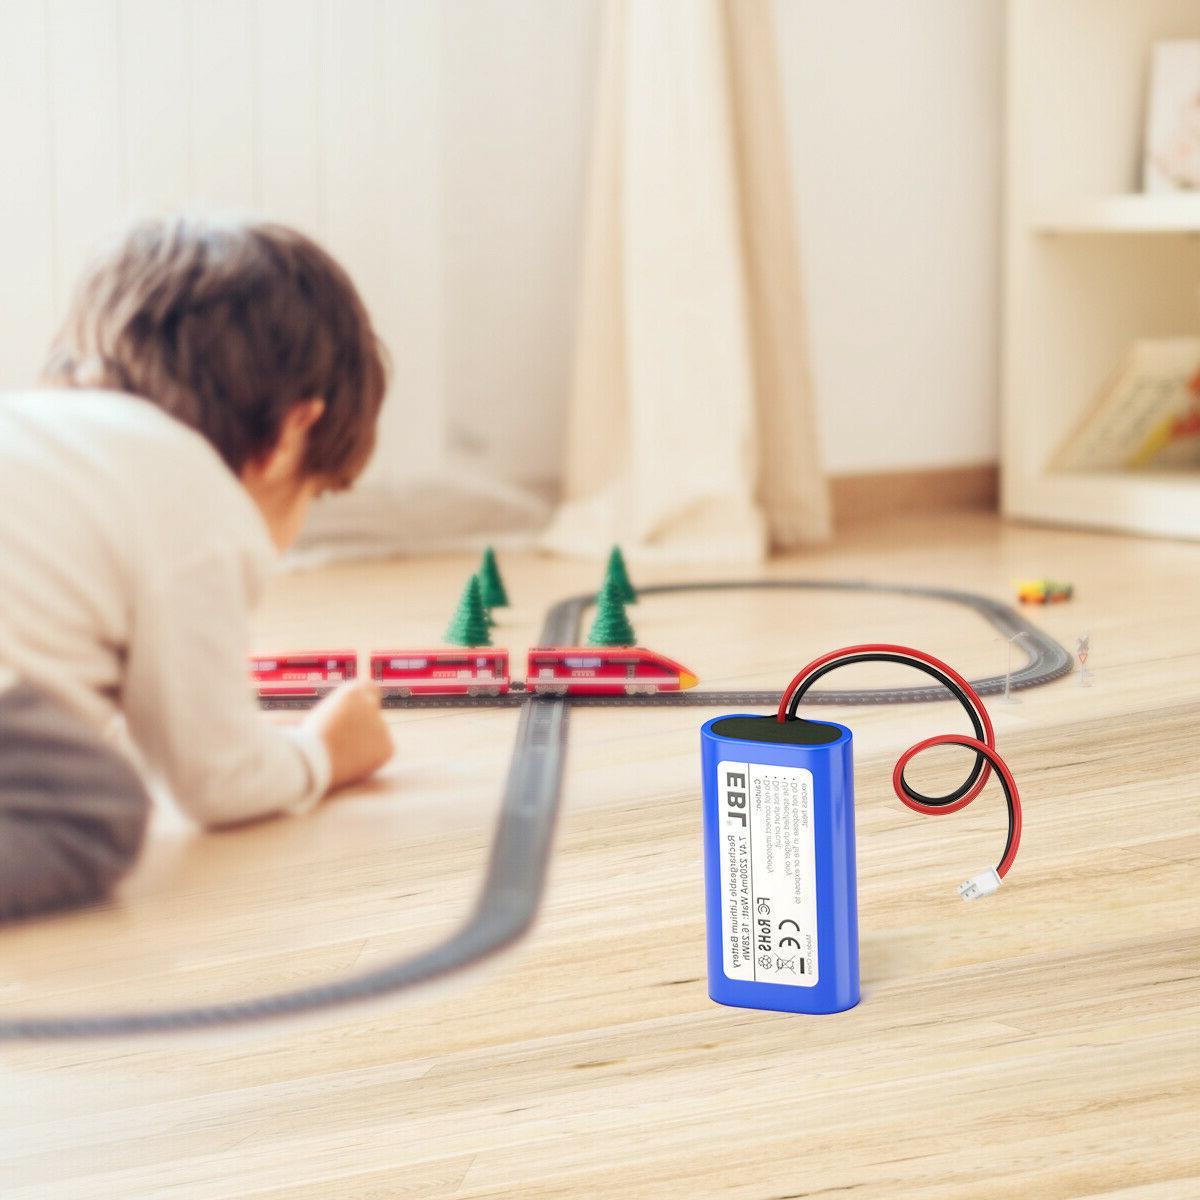 EBL 7.4V 2200mAh Rechargeable Batteries Replacement Toys Electronics